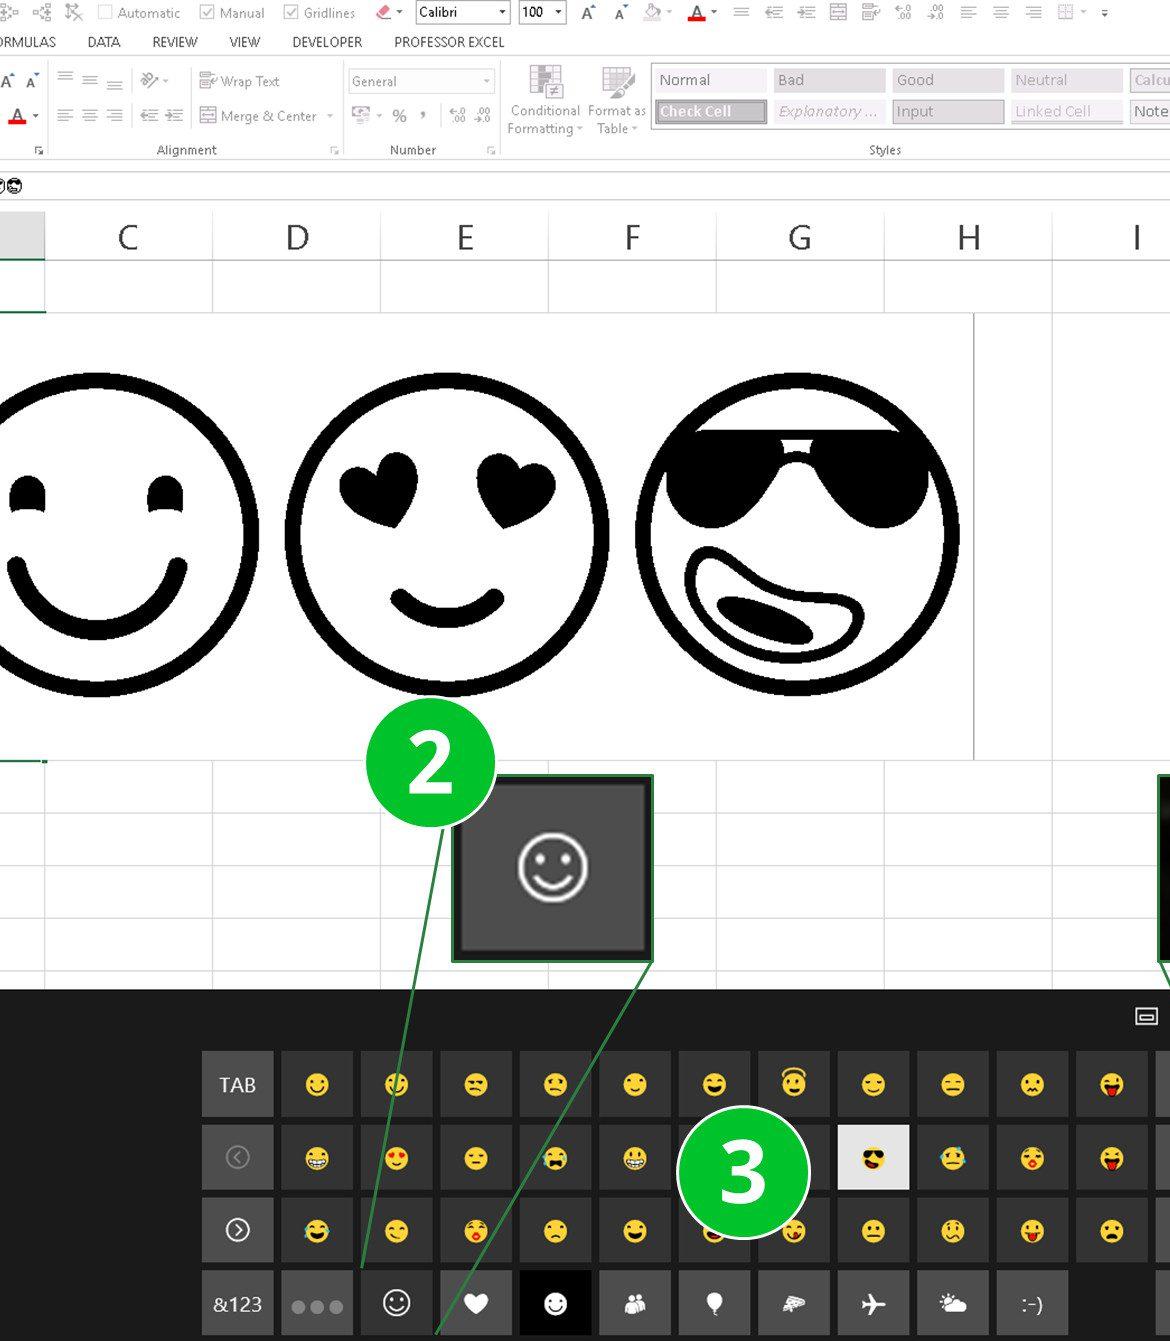 emoji, emojis, windows 8, windows 10, keyboard, excel, insert